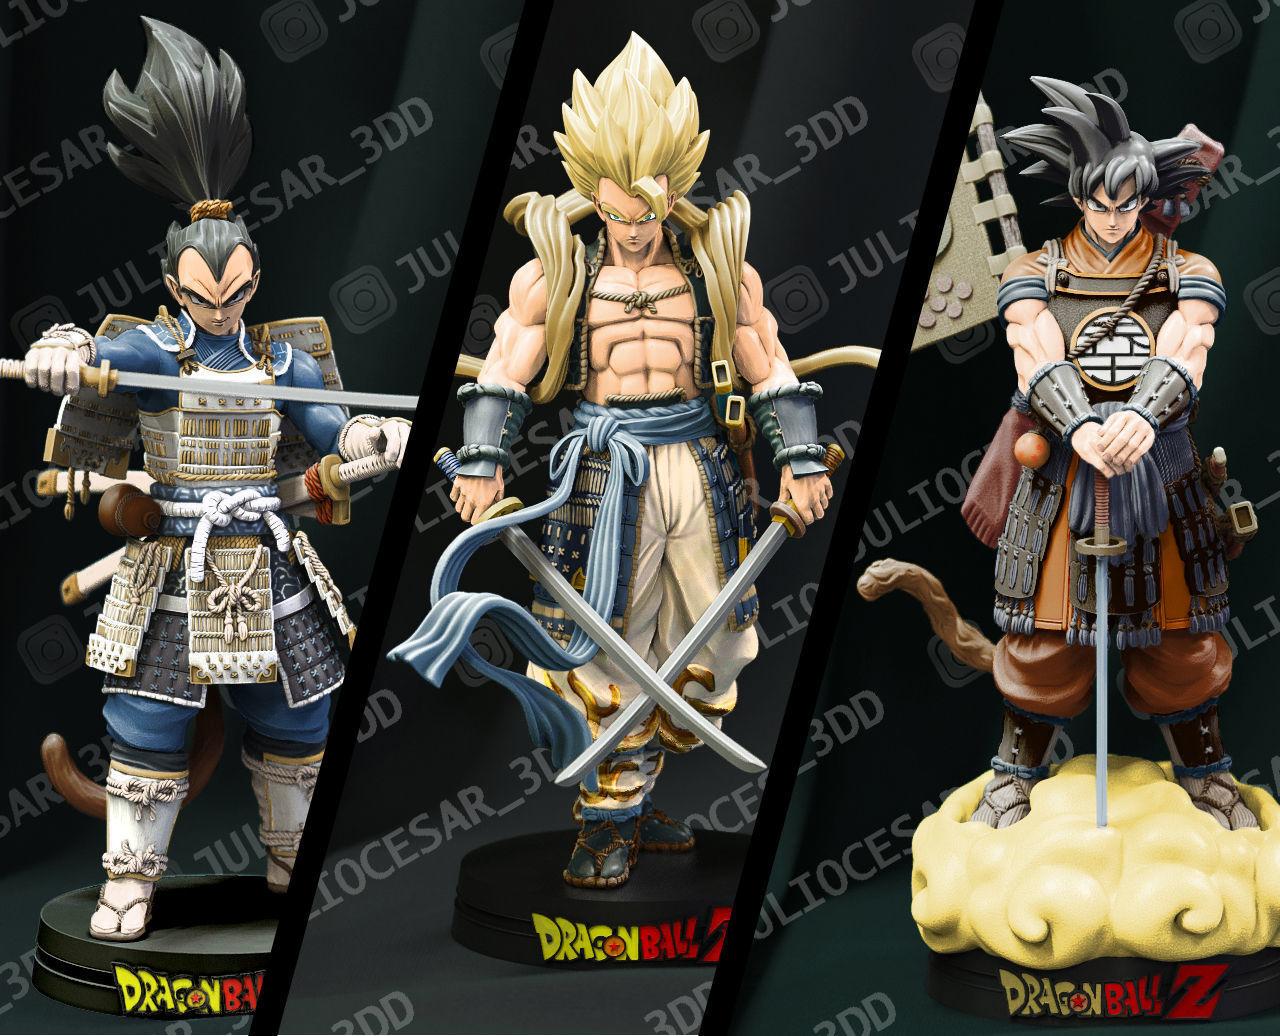 Dragon ball Shogun - Pack 3 heroes